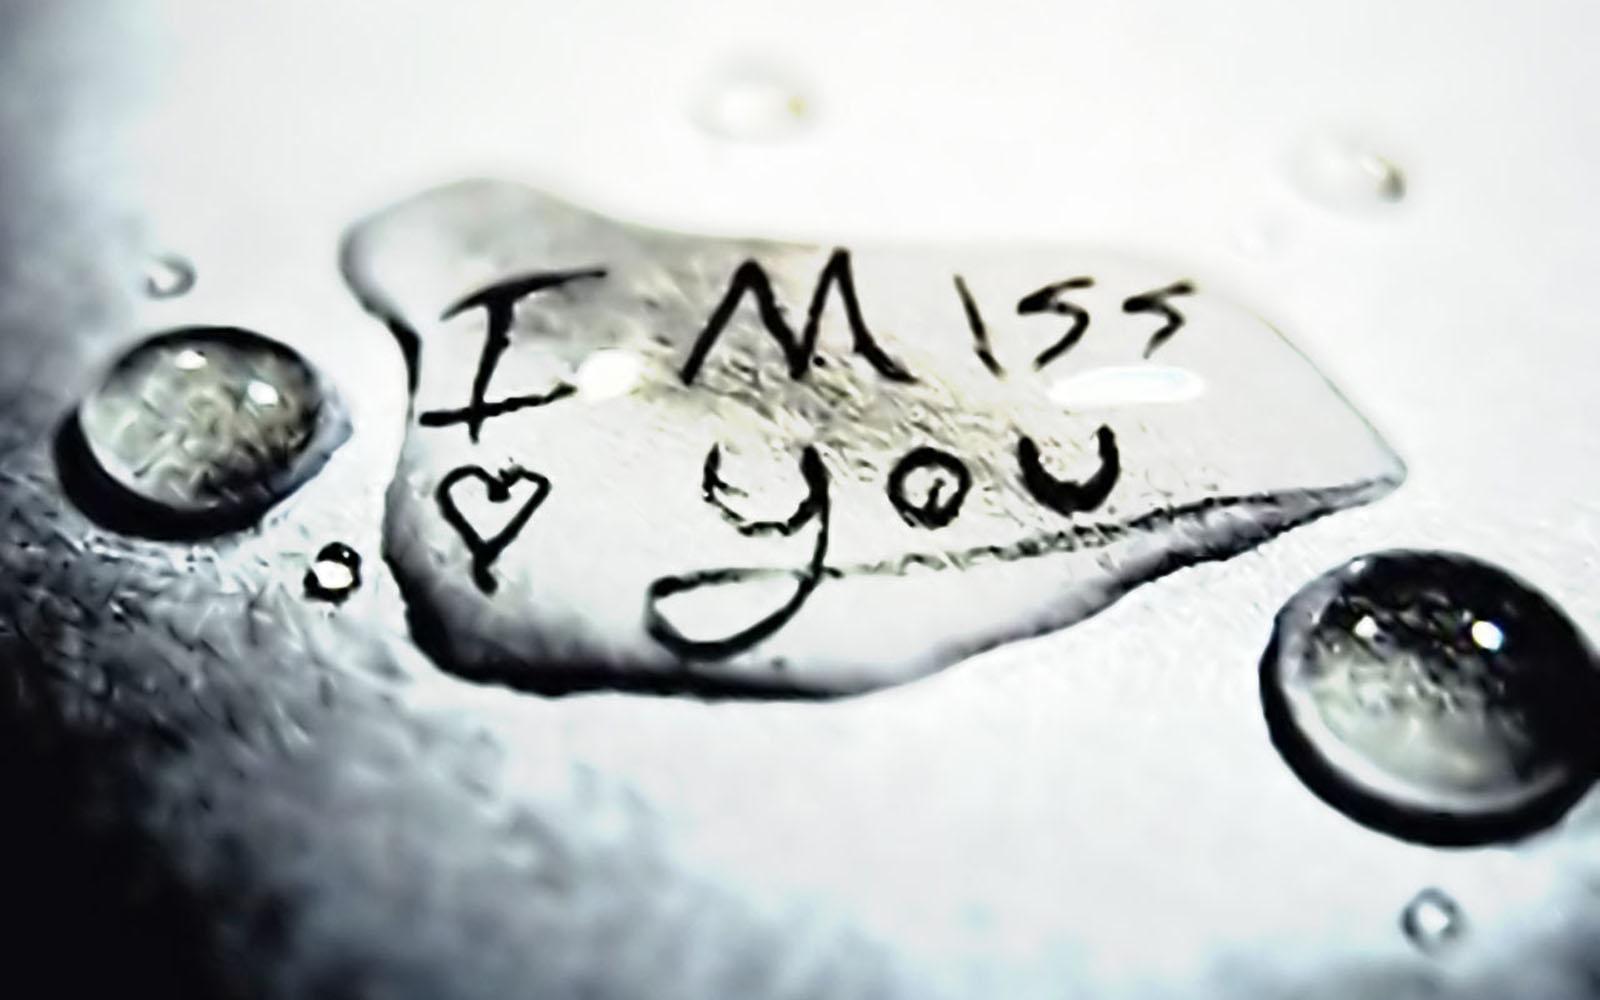 Gambar I Miss You Love Sad Wallpaper Download 1600x1000 Download Hd Wallpaper Wallpapertip